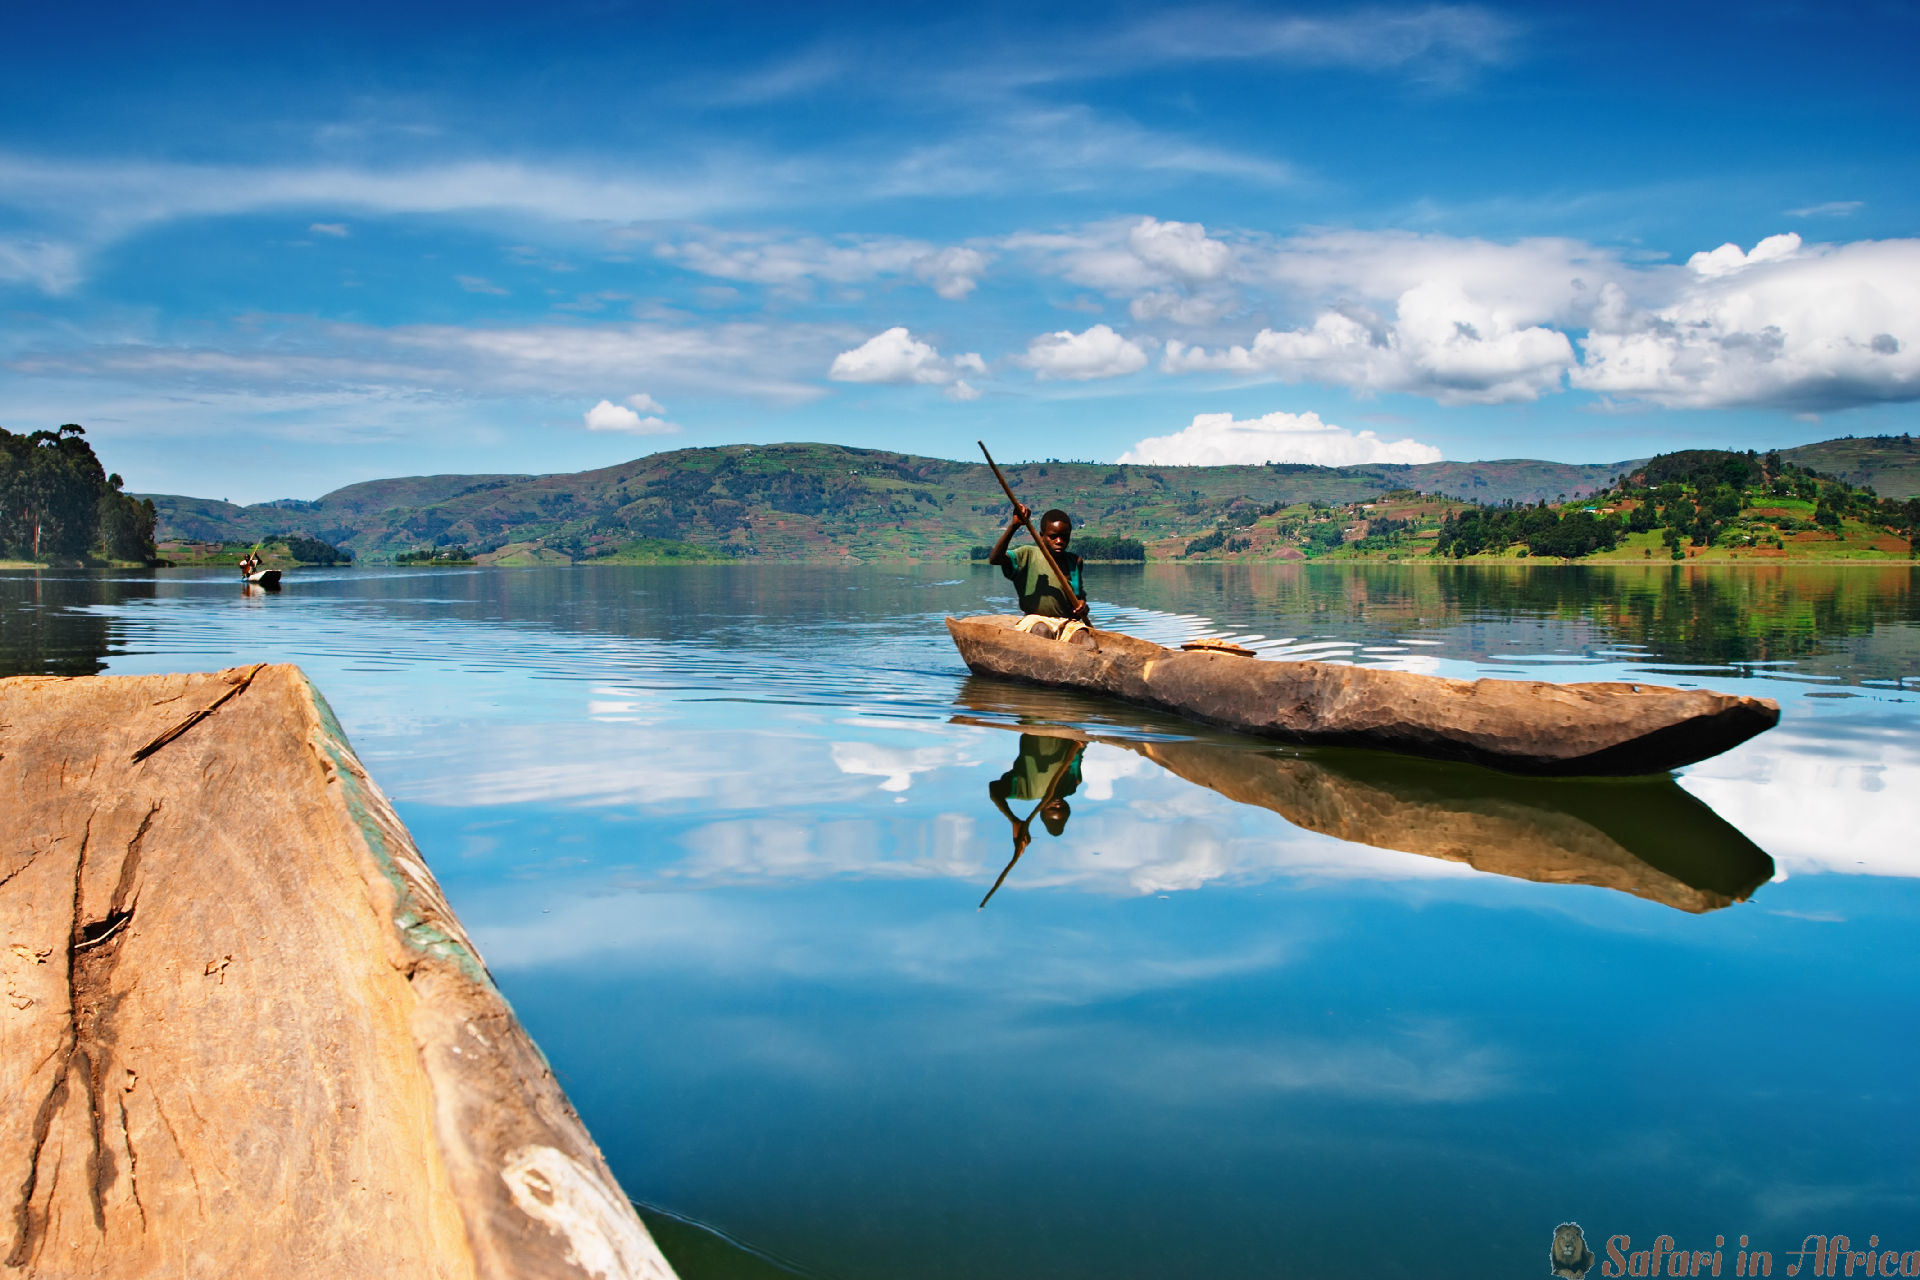 African boy in canoe, Bunyonyi lake, Uganda